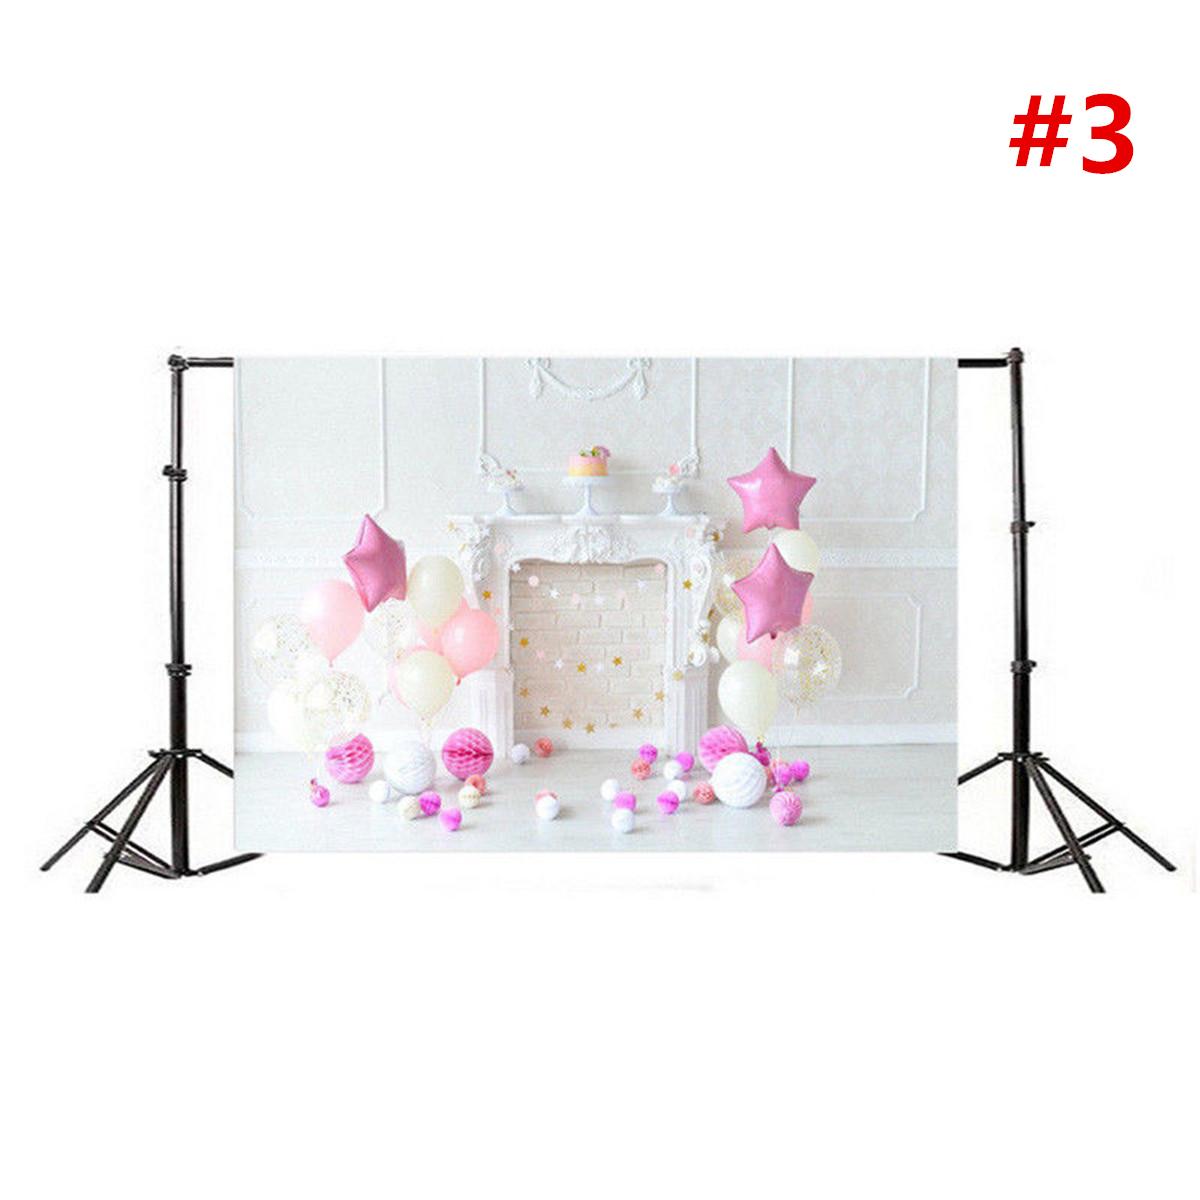 Fairy tale Vinyl backdrop background Photography studio Photo Props 5X7FT SN197